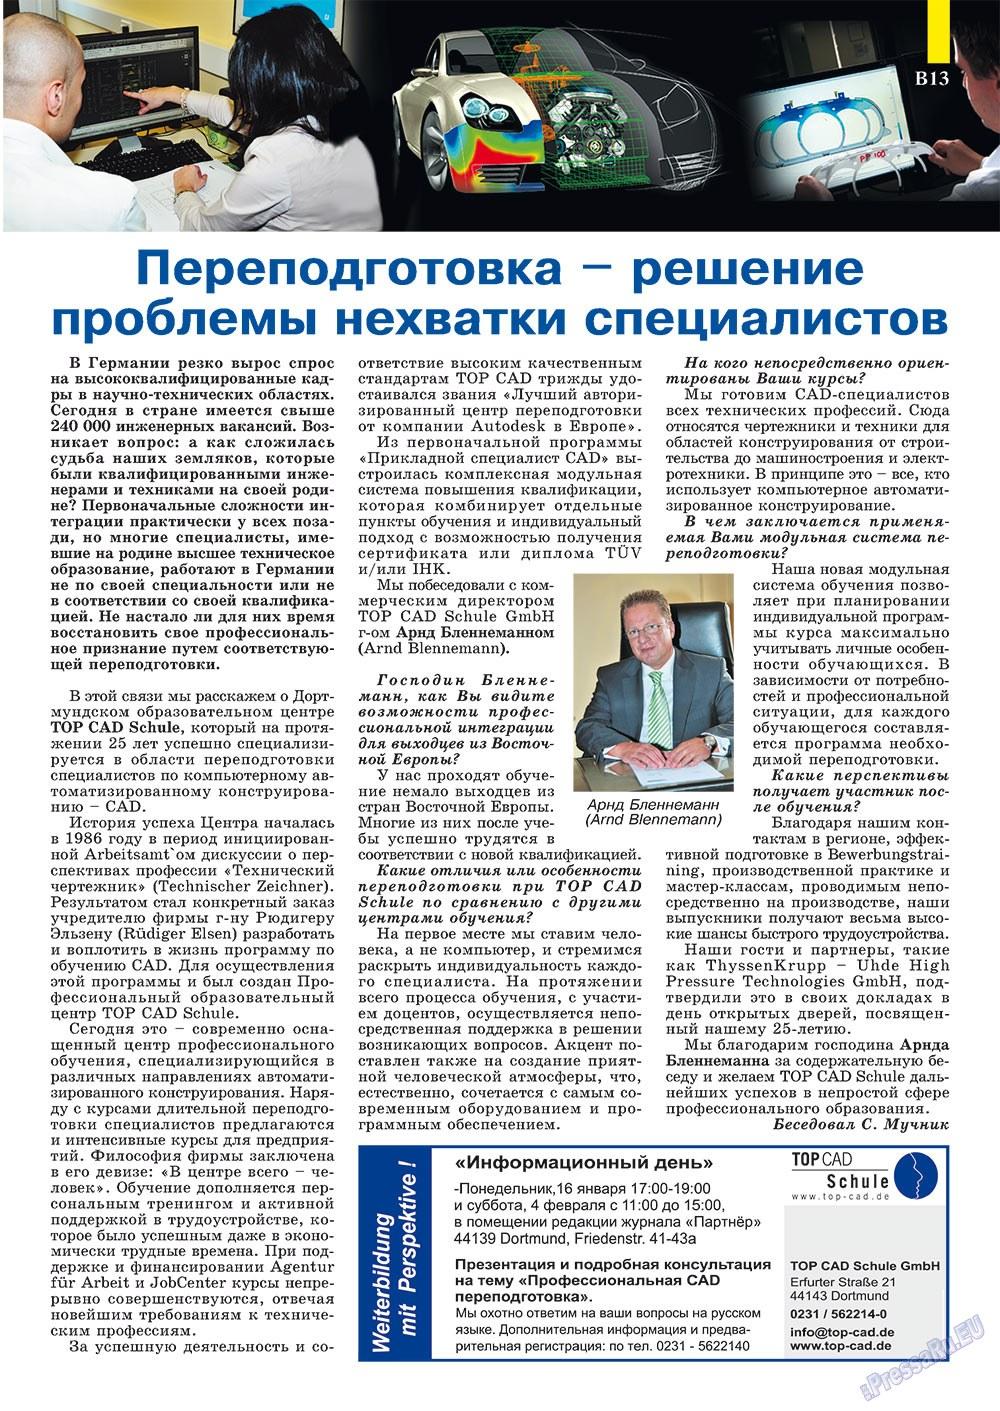 Партнер-север (журнал). 2012 год, номер 1, стр. 23